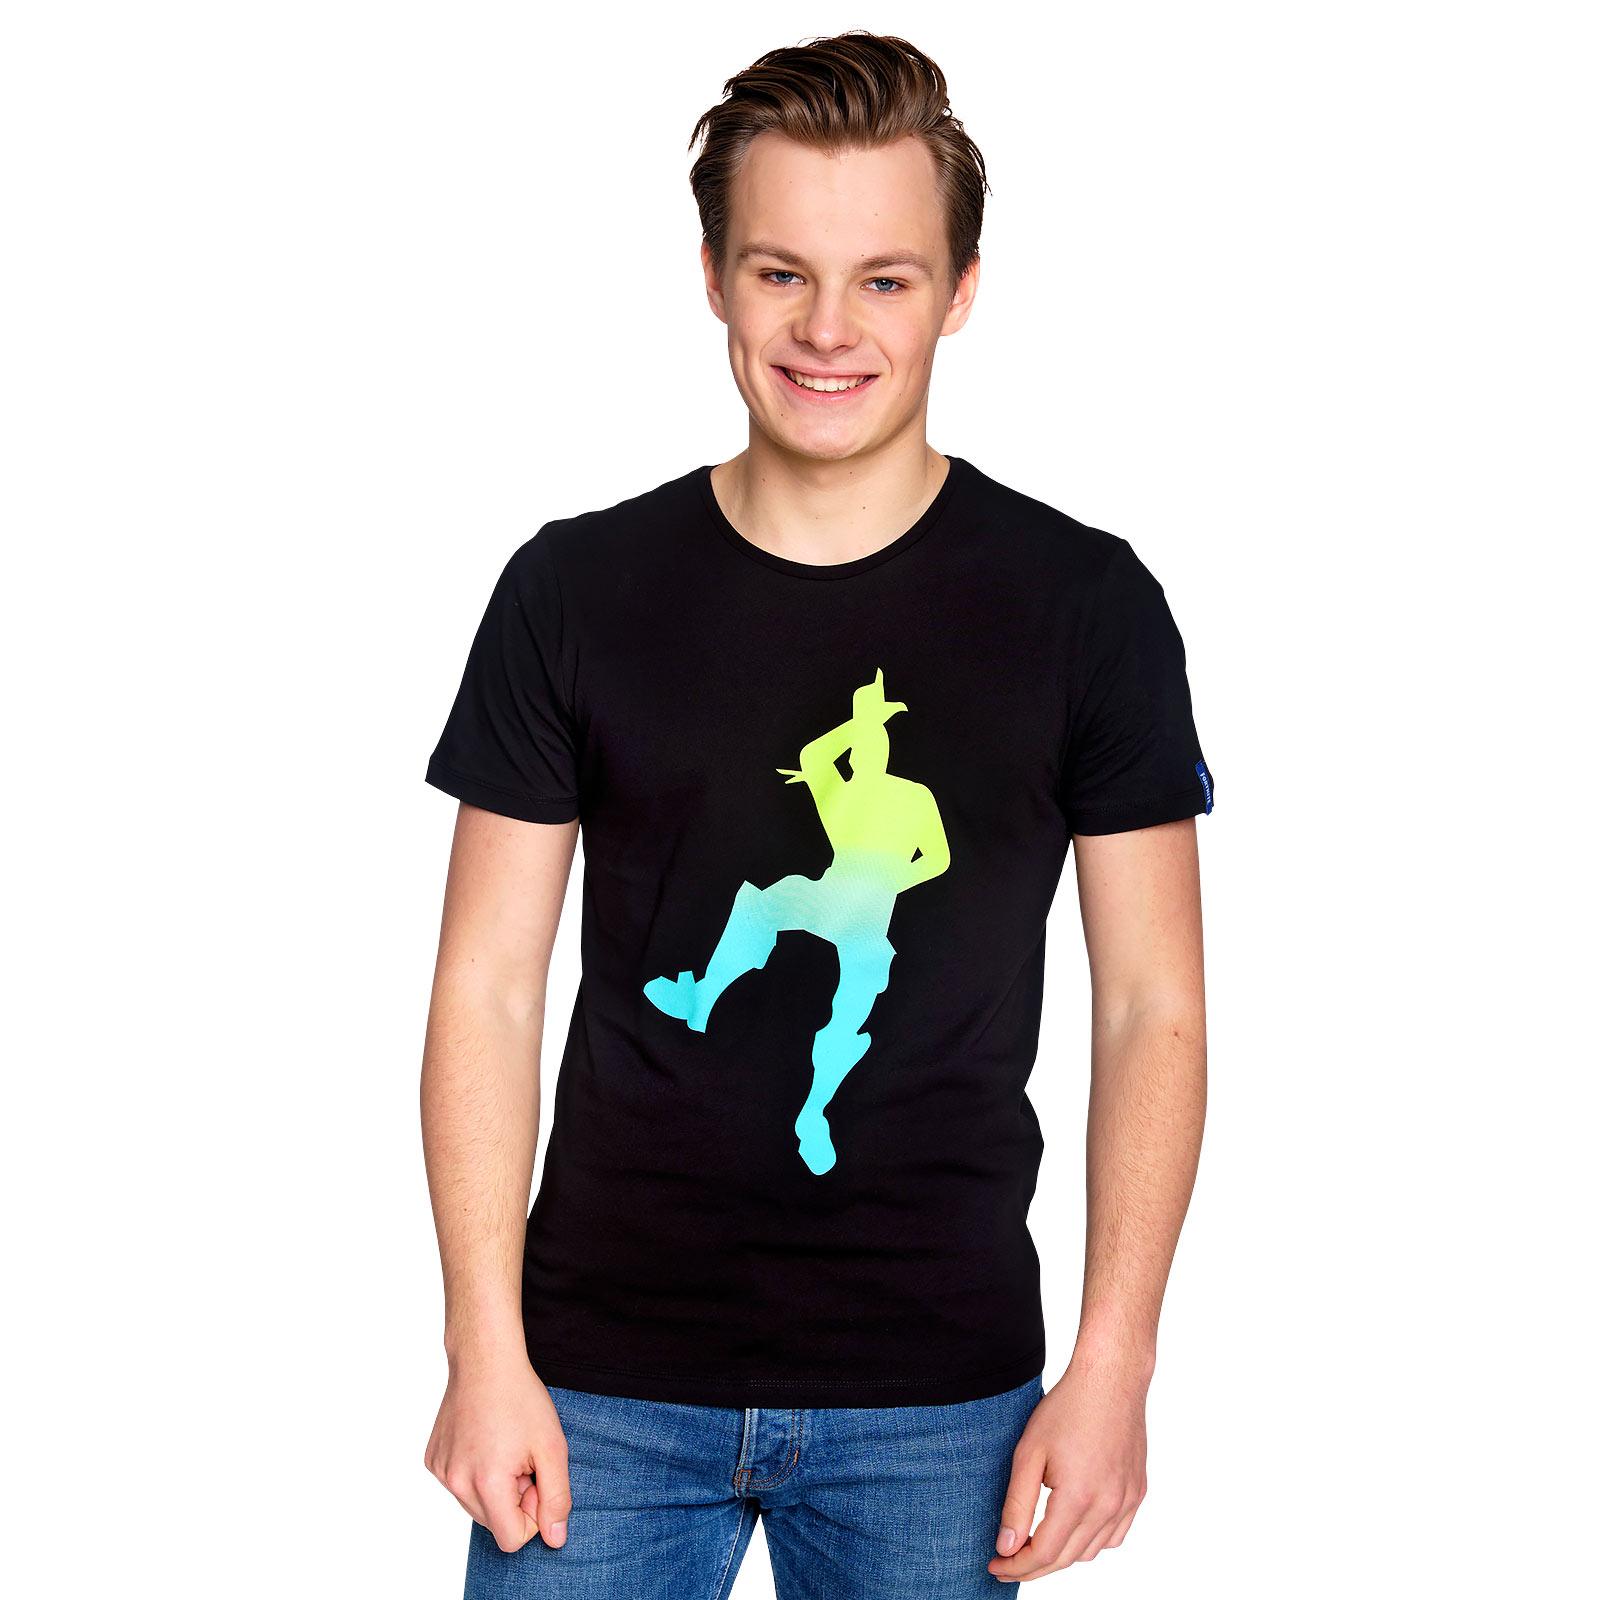 Fortnite - Take the L Dance T-Shirt schwarz